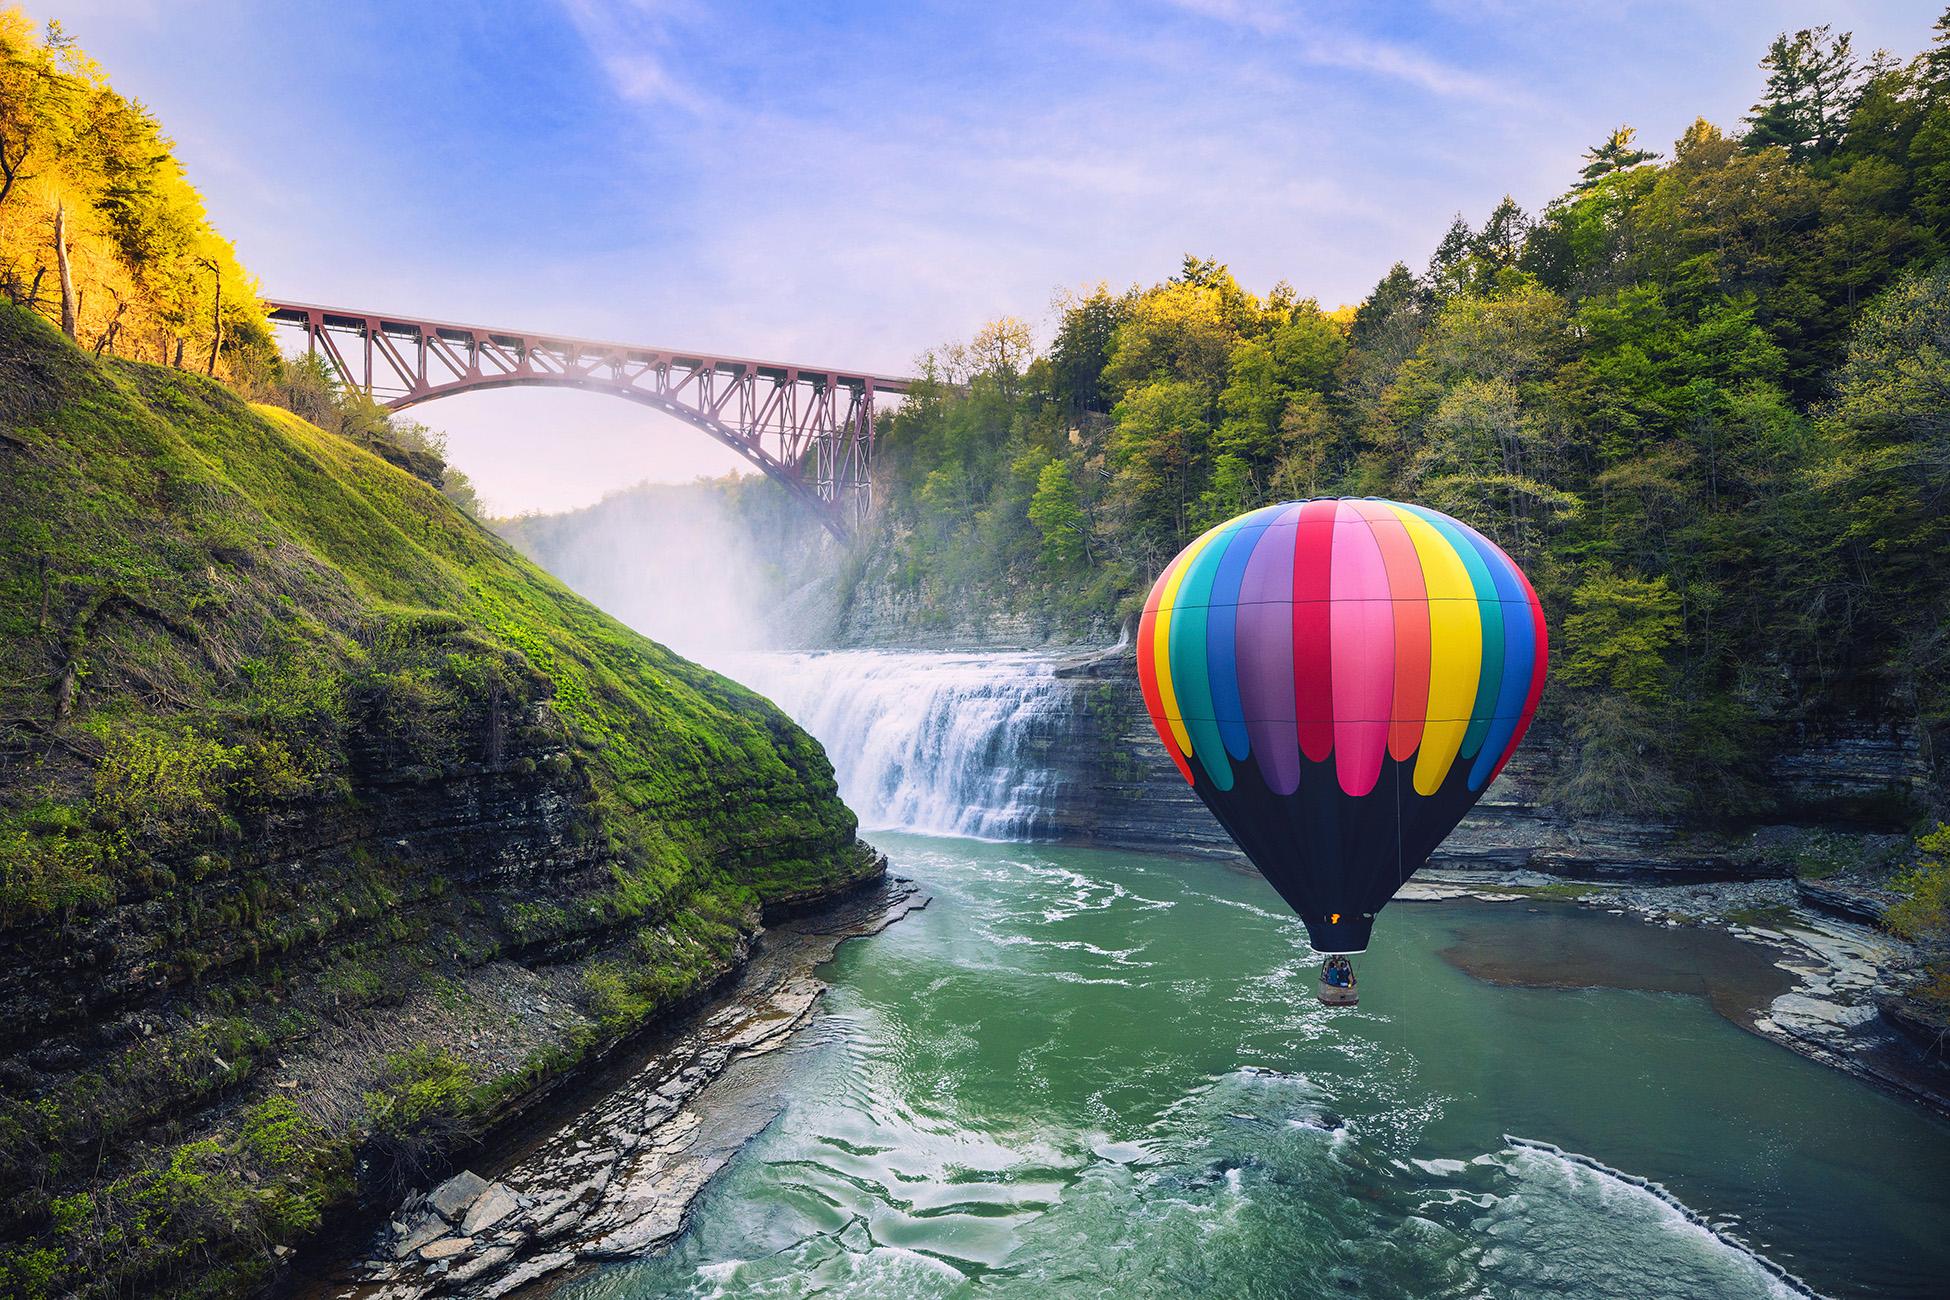 Balloon by Upper Falls and Railroad Bridge in Letchworth